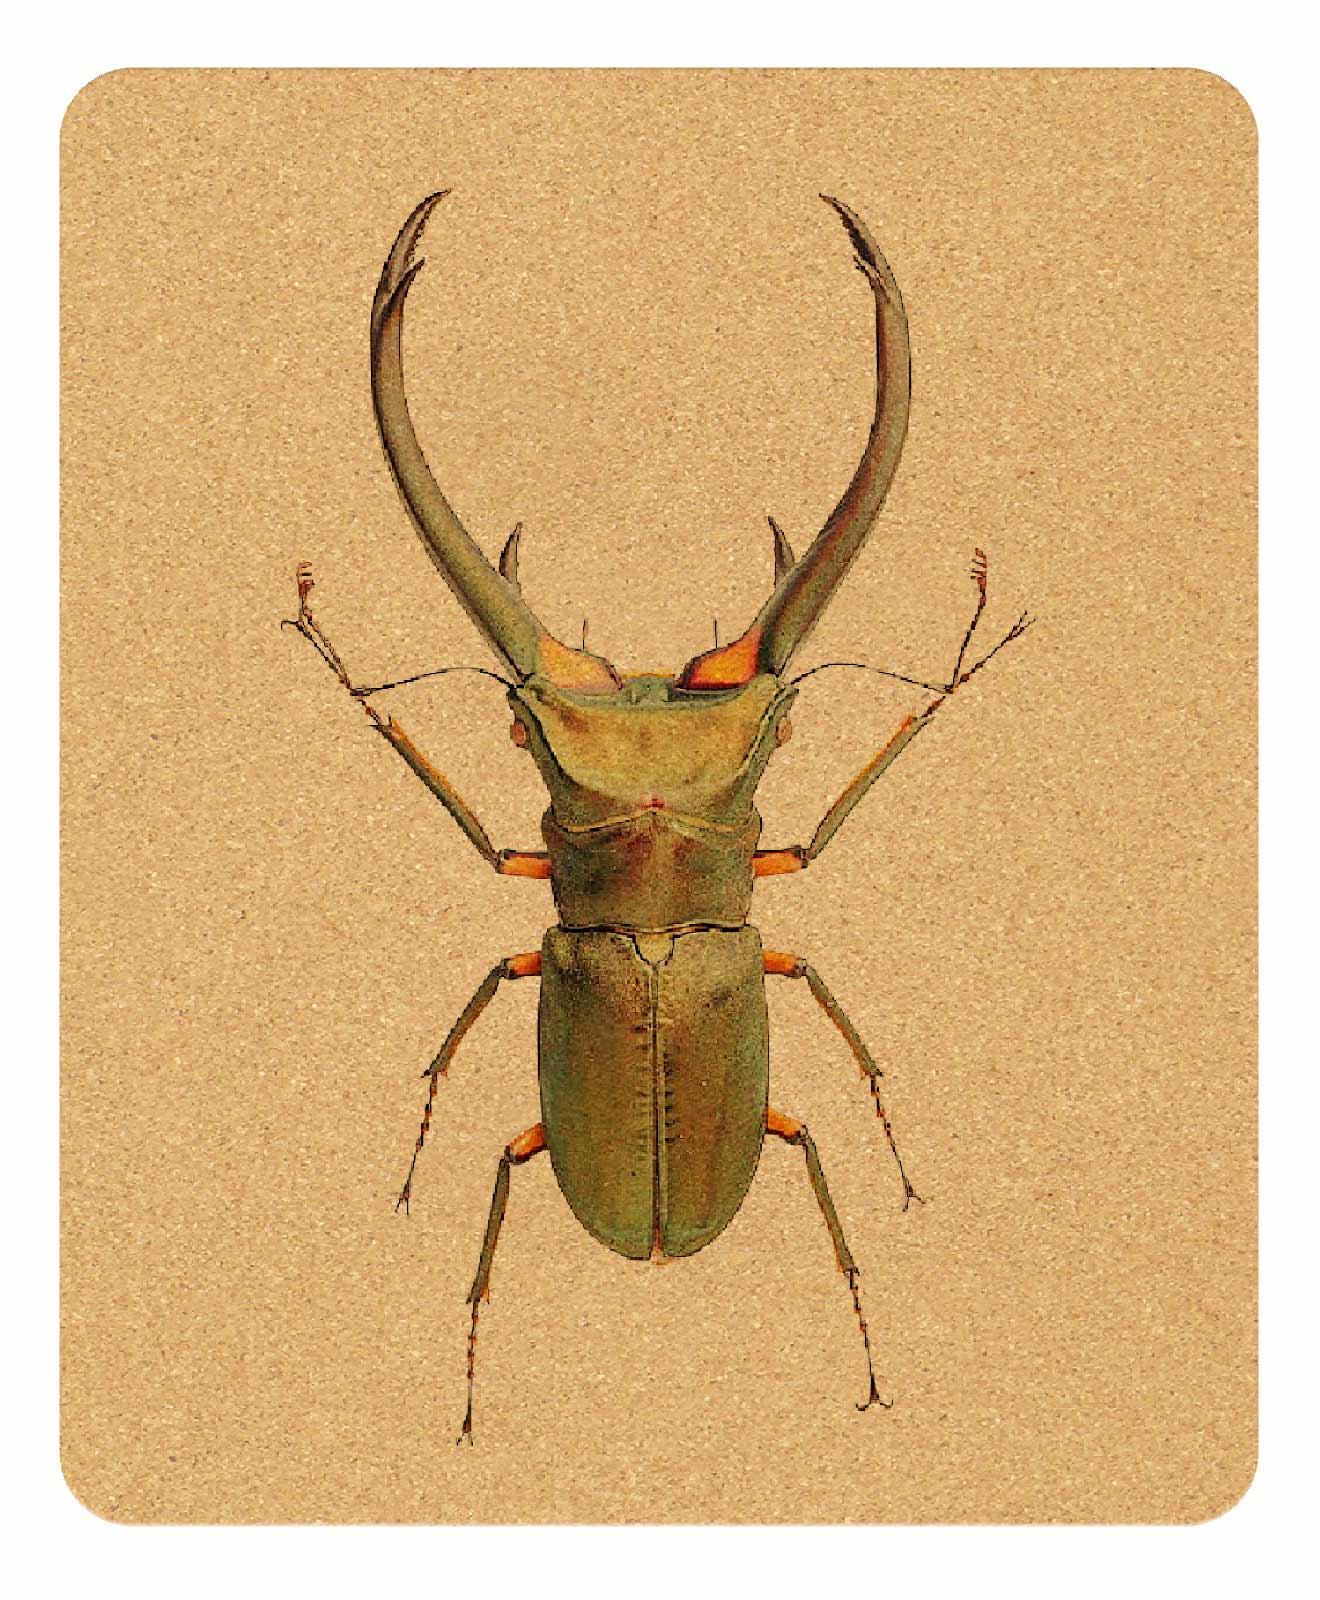 thursday Bug Cork Mousepad rectangular